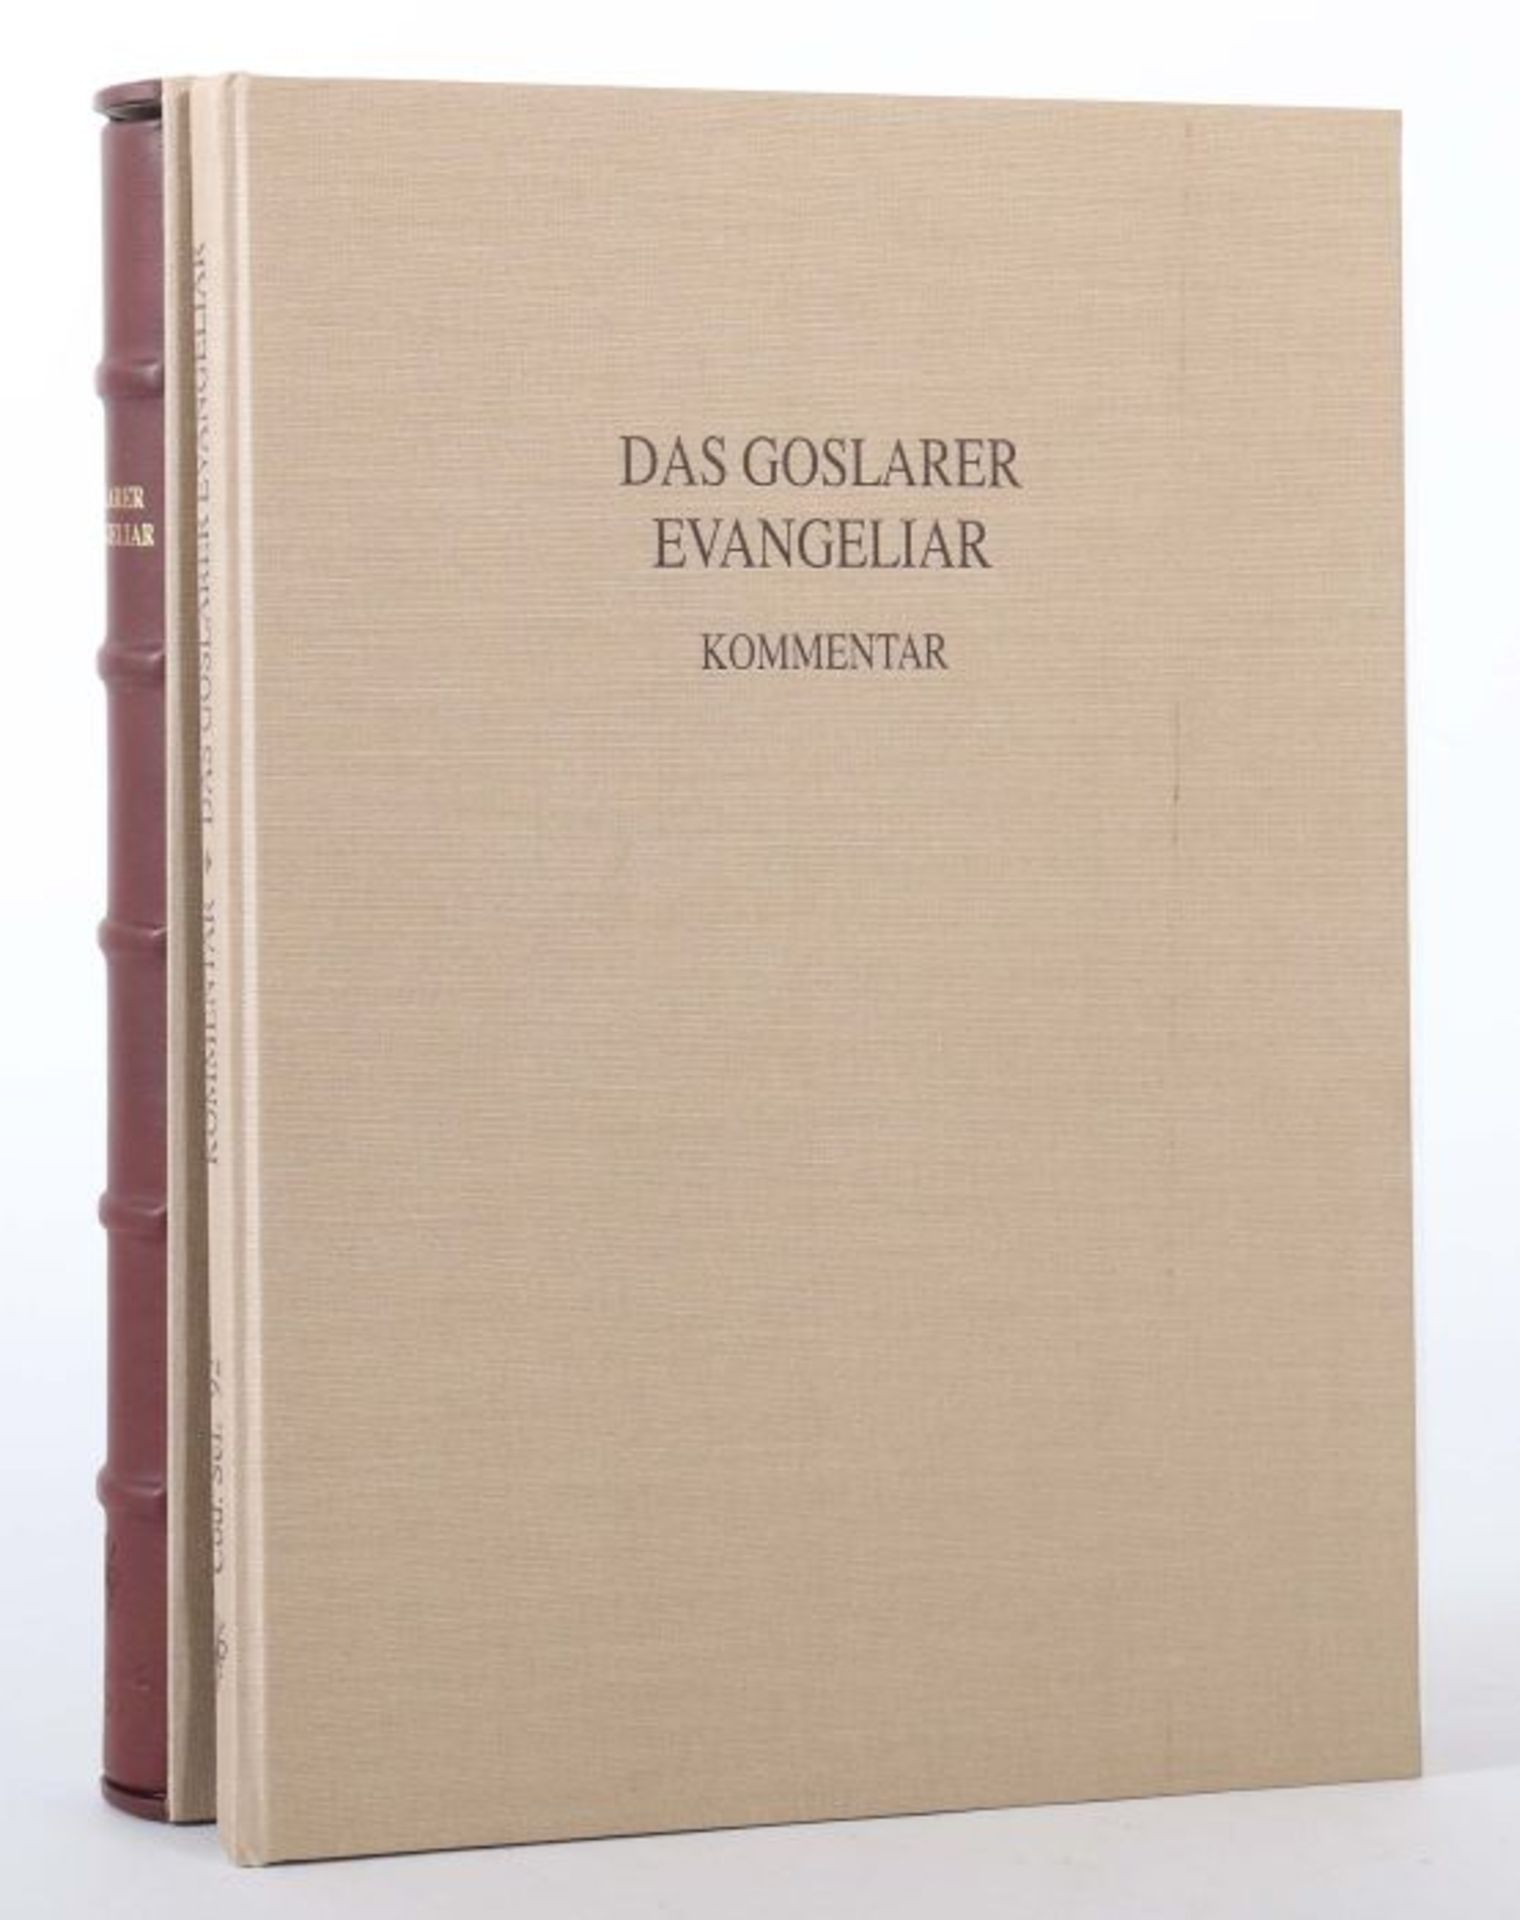 Goslarer Evangeliar Aus dem Stadtarchiv Goslar, Volumen XCII der Reihe Codices Selecti, Goslar/ - Bild 6 aus 6